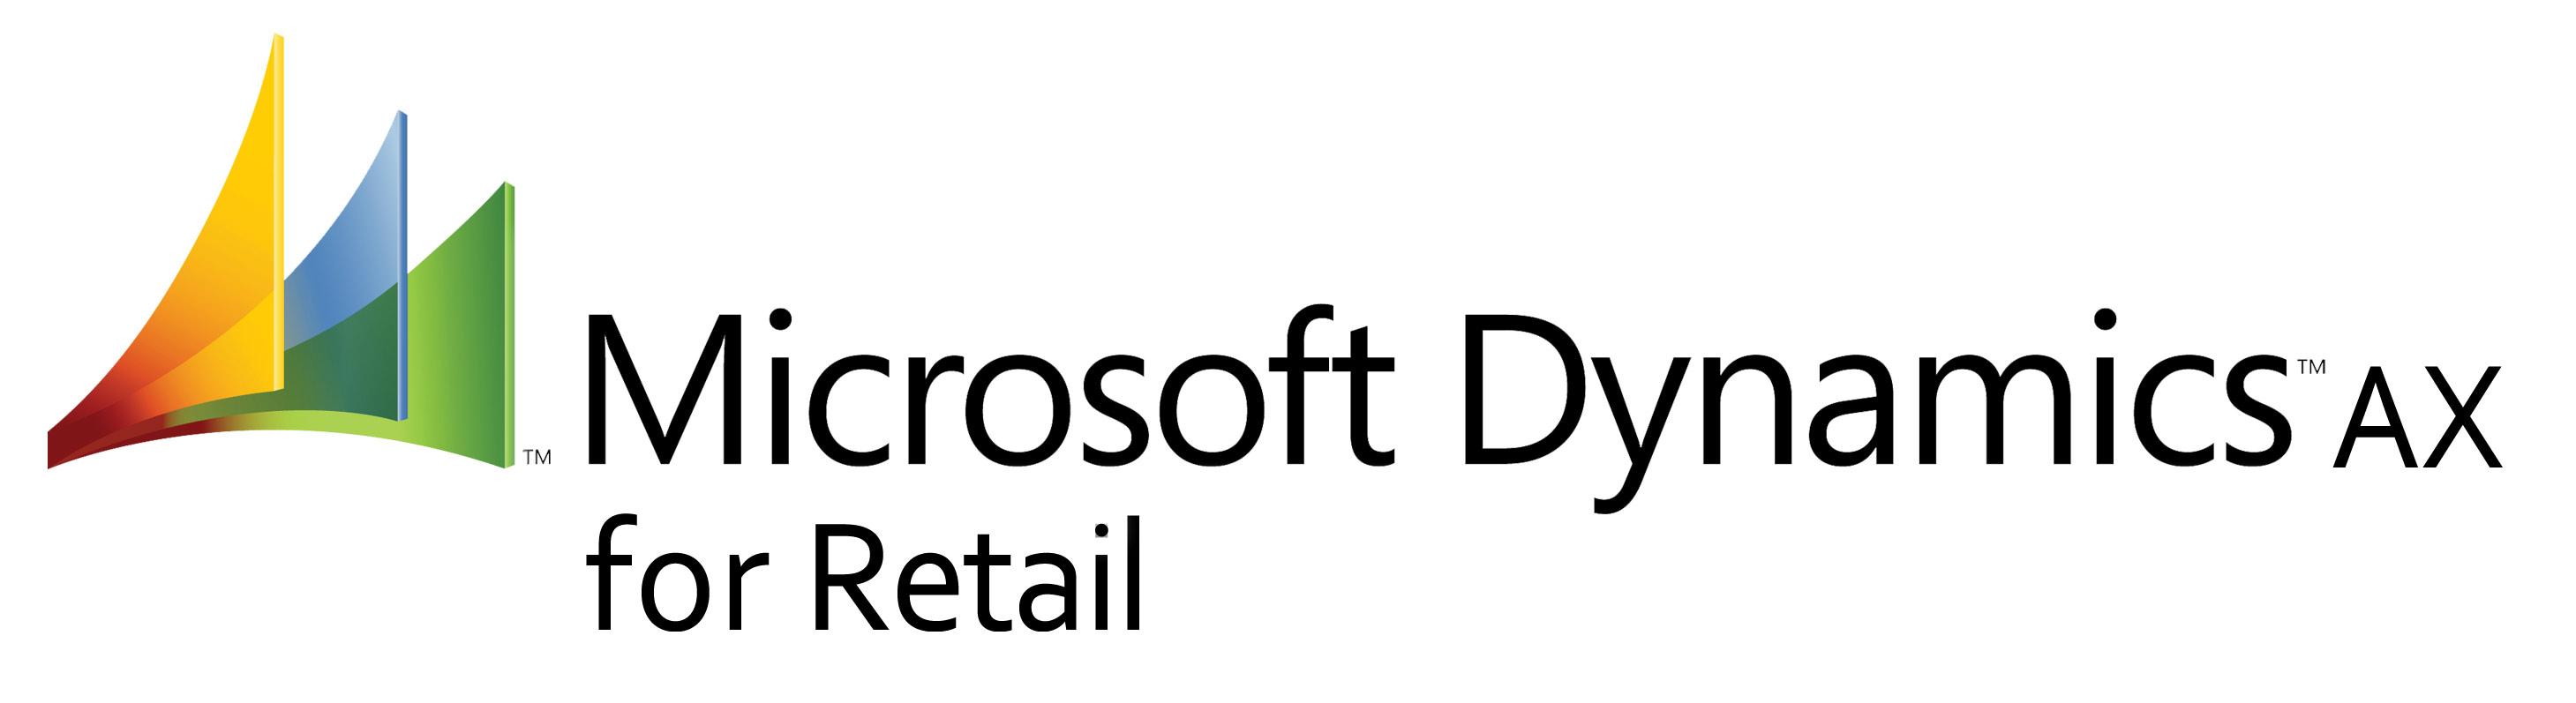 microsoft-dynamics-ax-retail